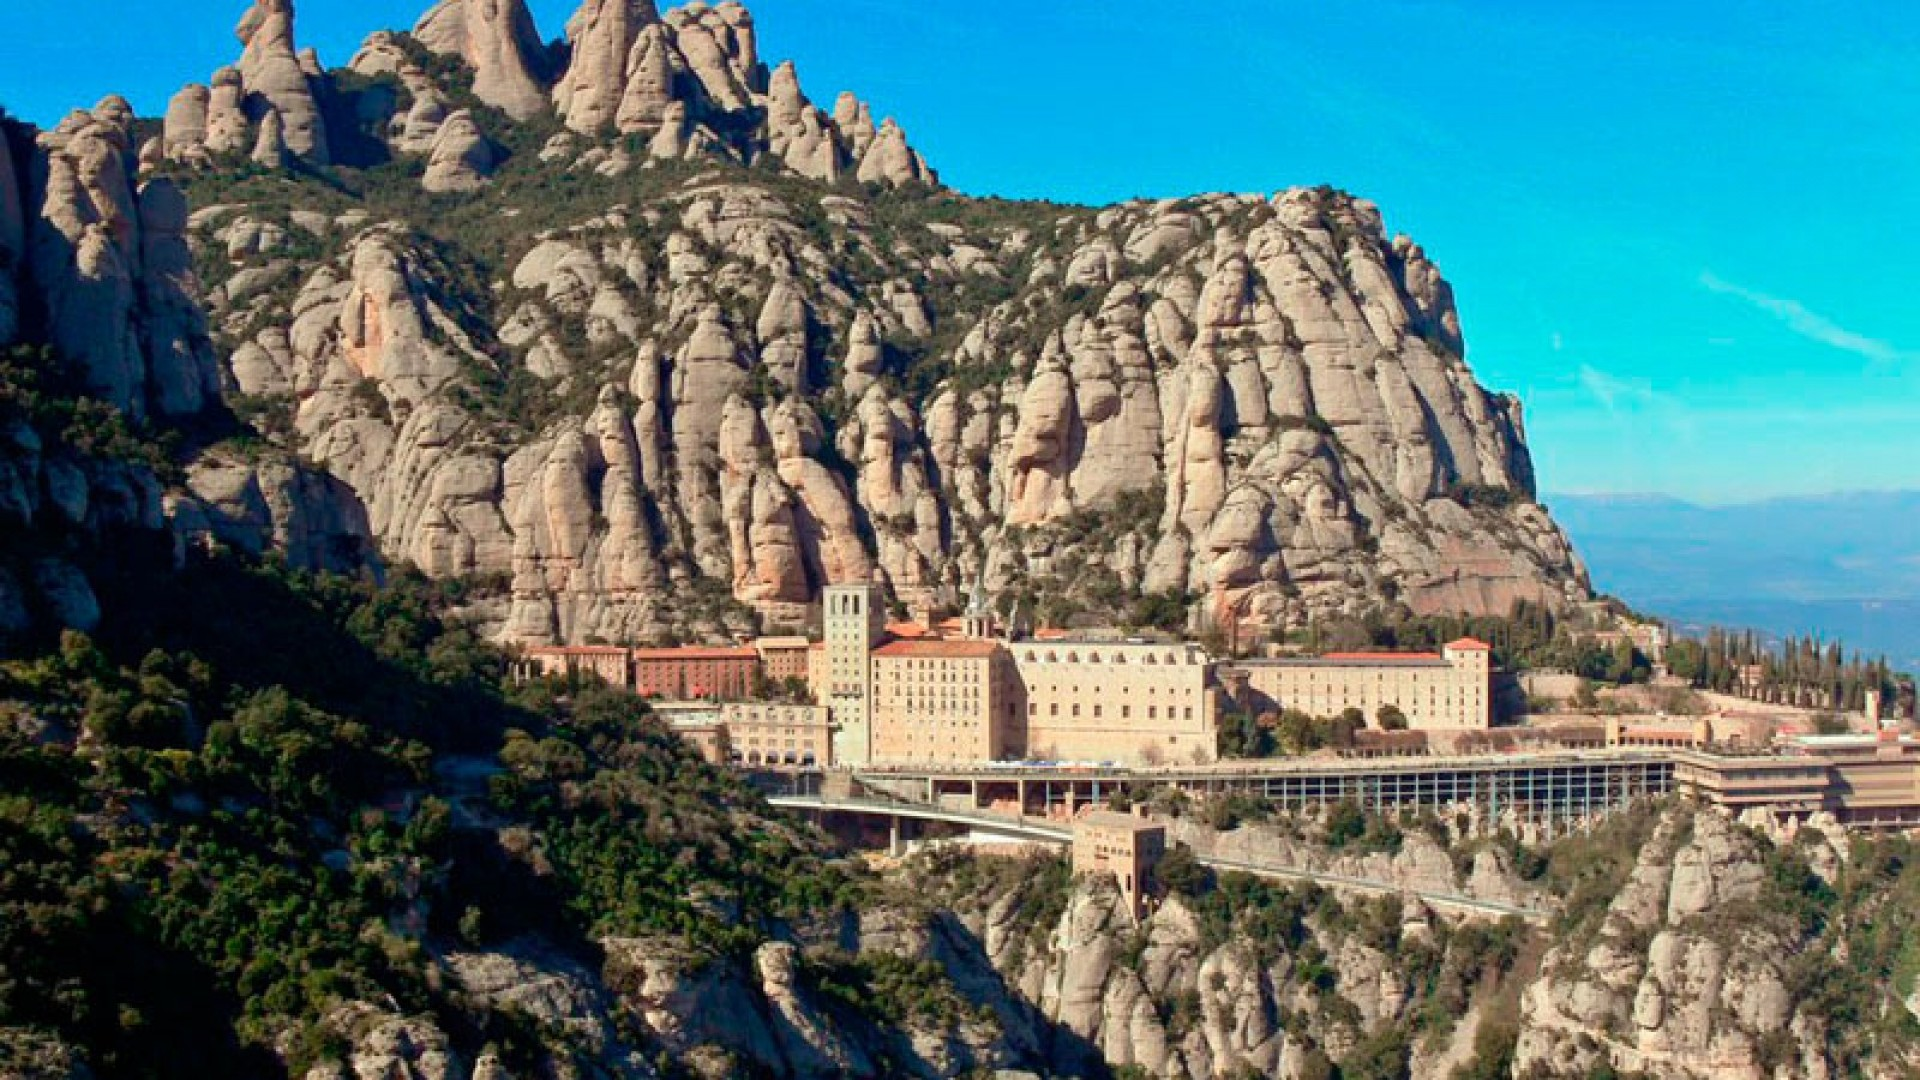 Visite Montserrat